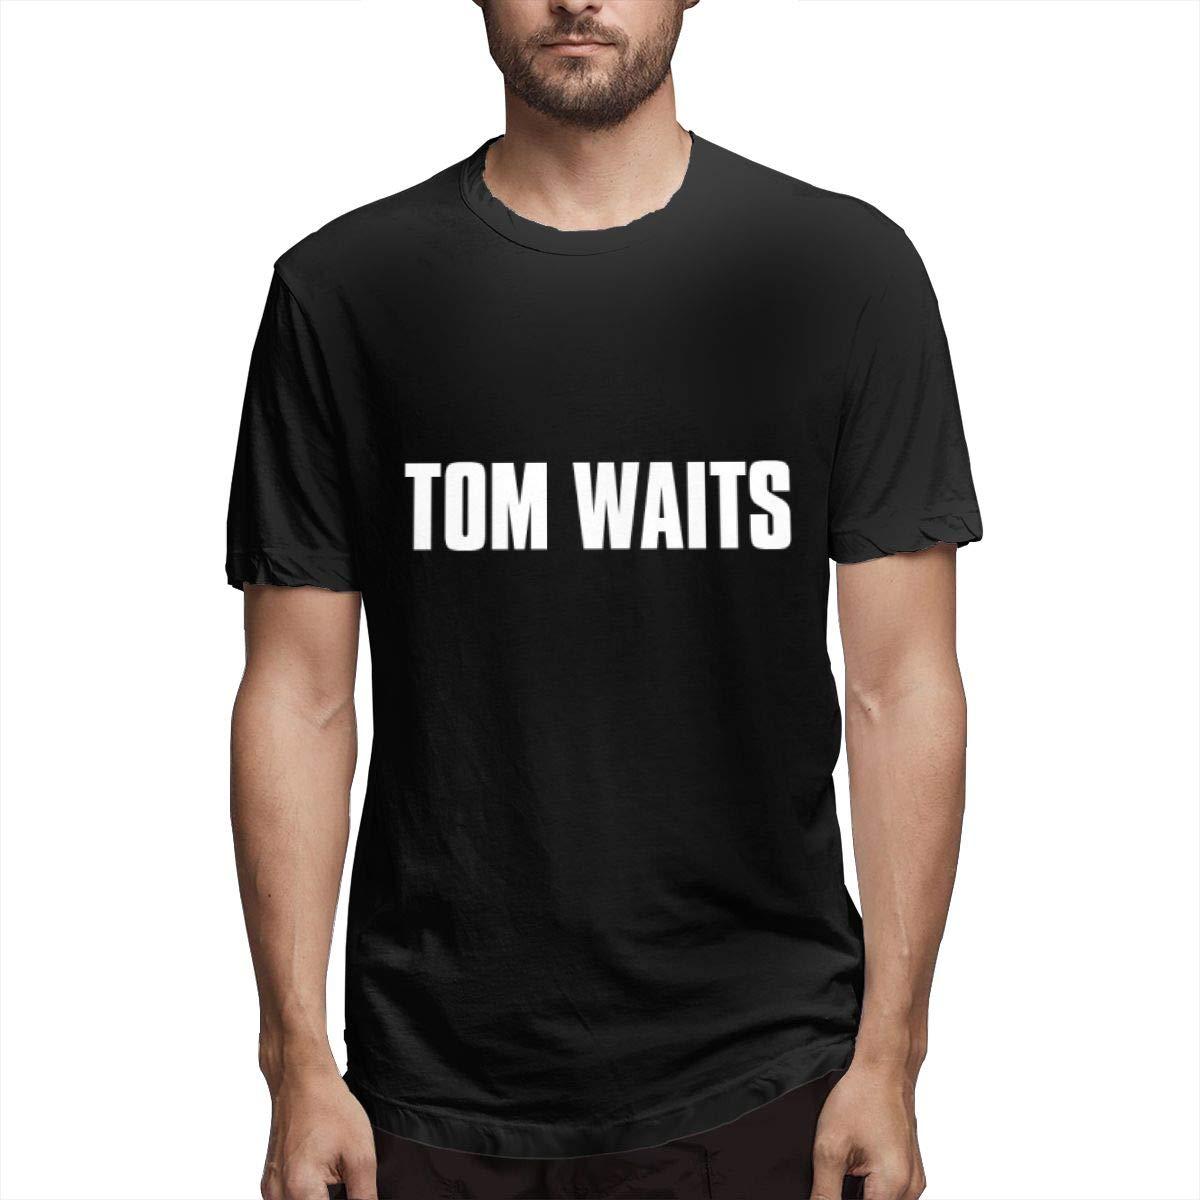 Lihehen Tom Waits Logo Simple Casual Round Neck Shirts